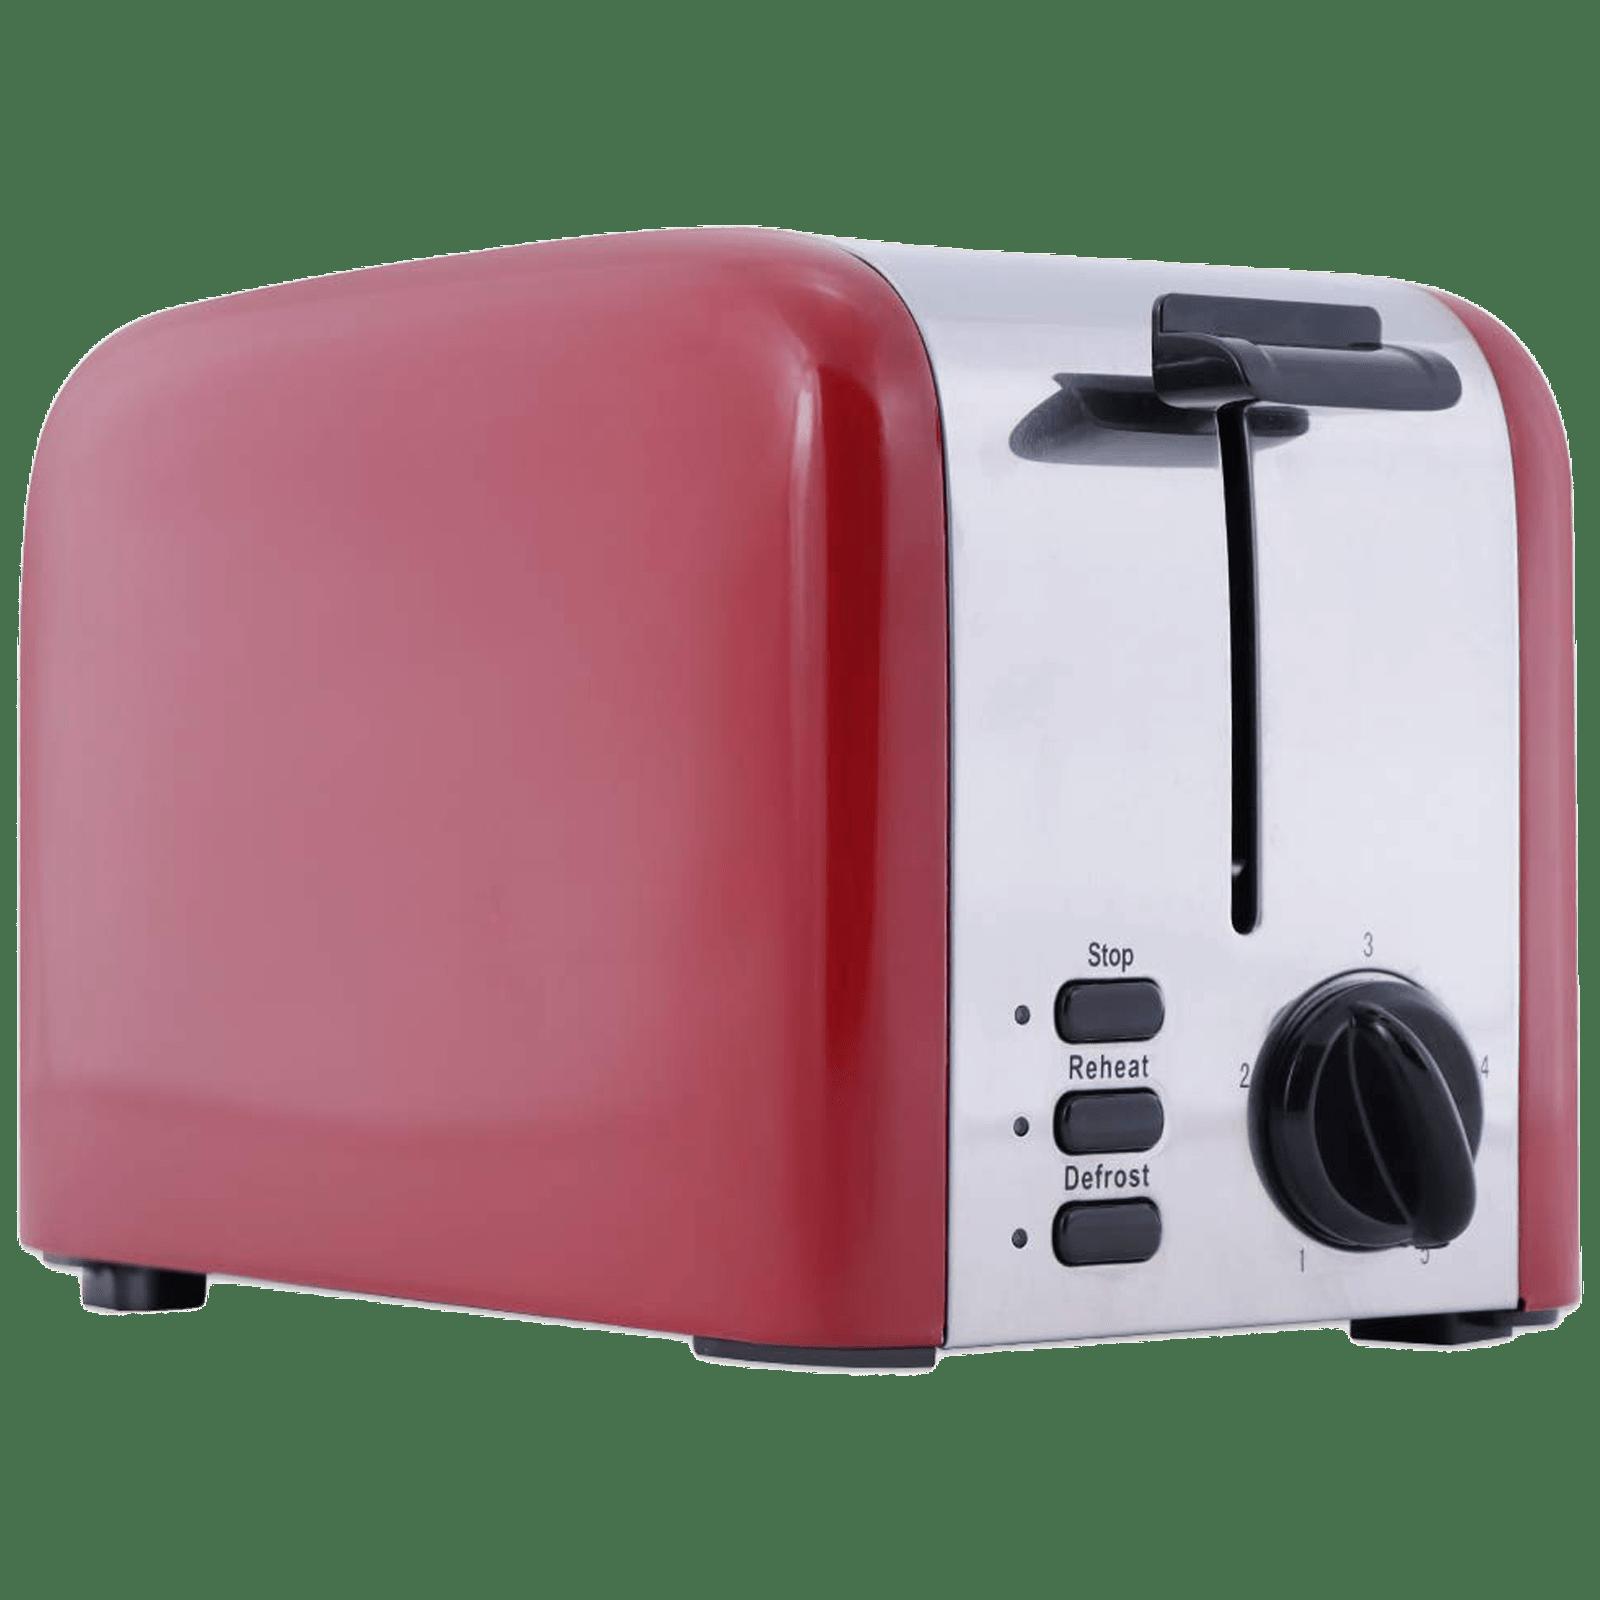 Wonderchef Crimson Edge 850 Watts 2 Slice Automatic Pop-up Toaster (Reheat Function, 63153584, Red)